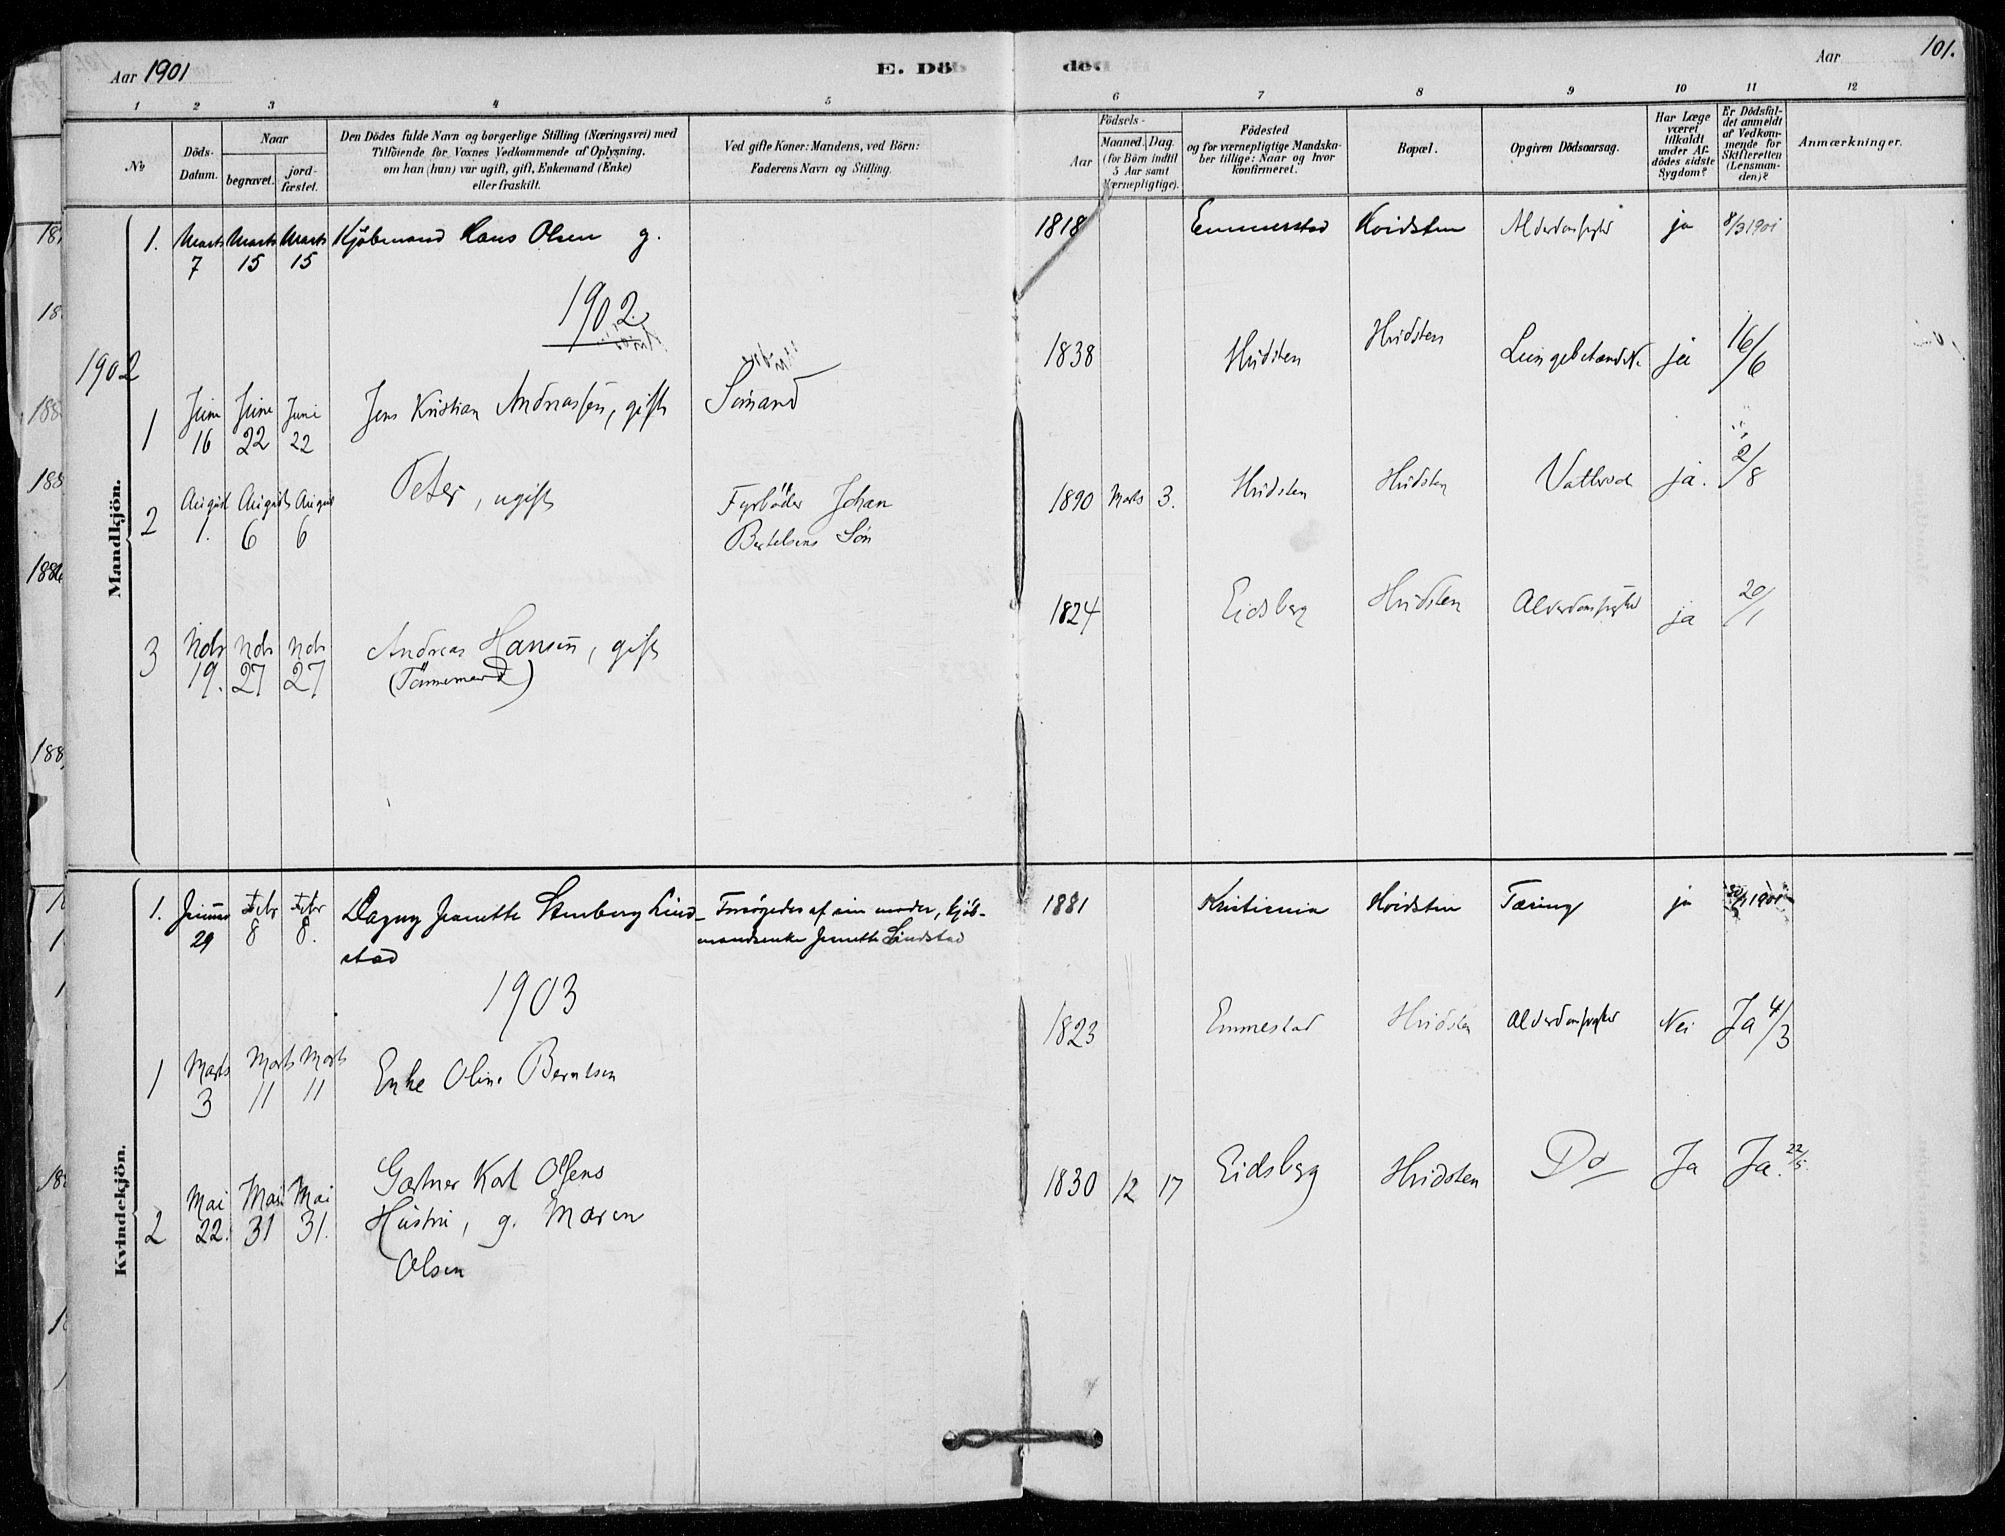 SAO, Vestby prestekontor Kirkebøker, F/Fd/L0001: Ministerialbok nr. IV 1, 1878-1945, s. 101